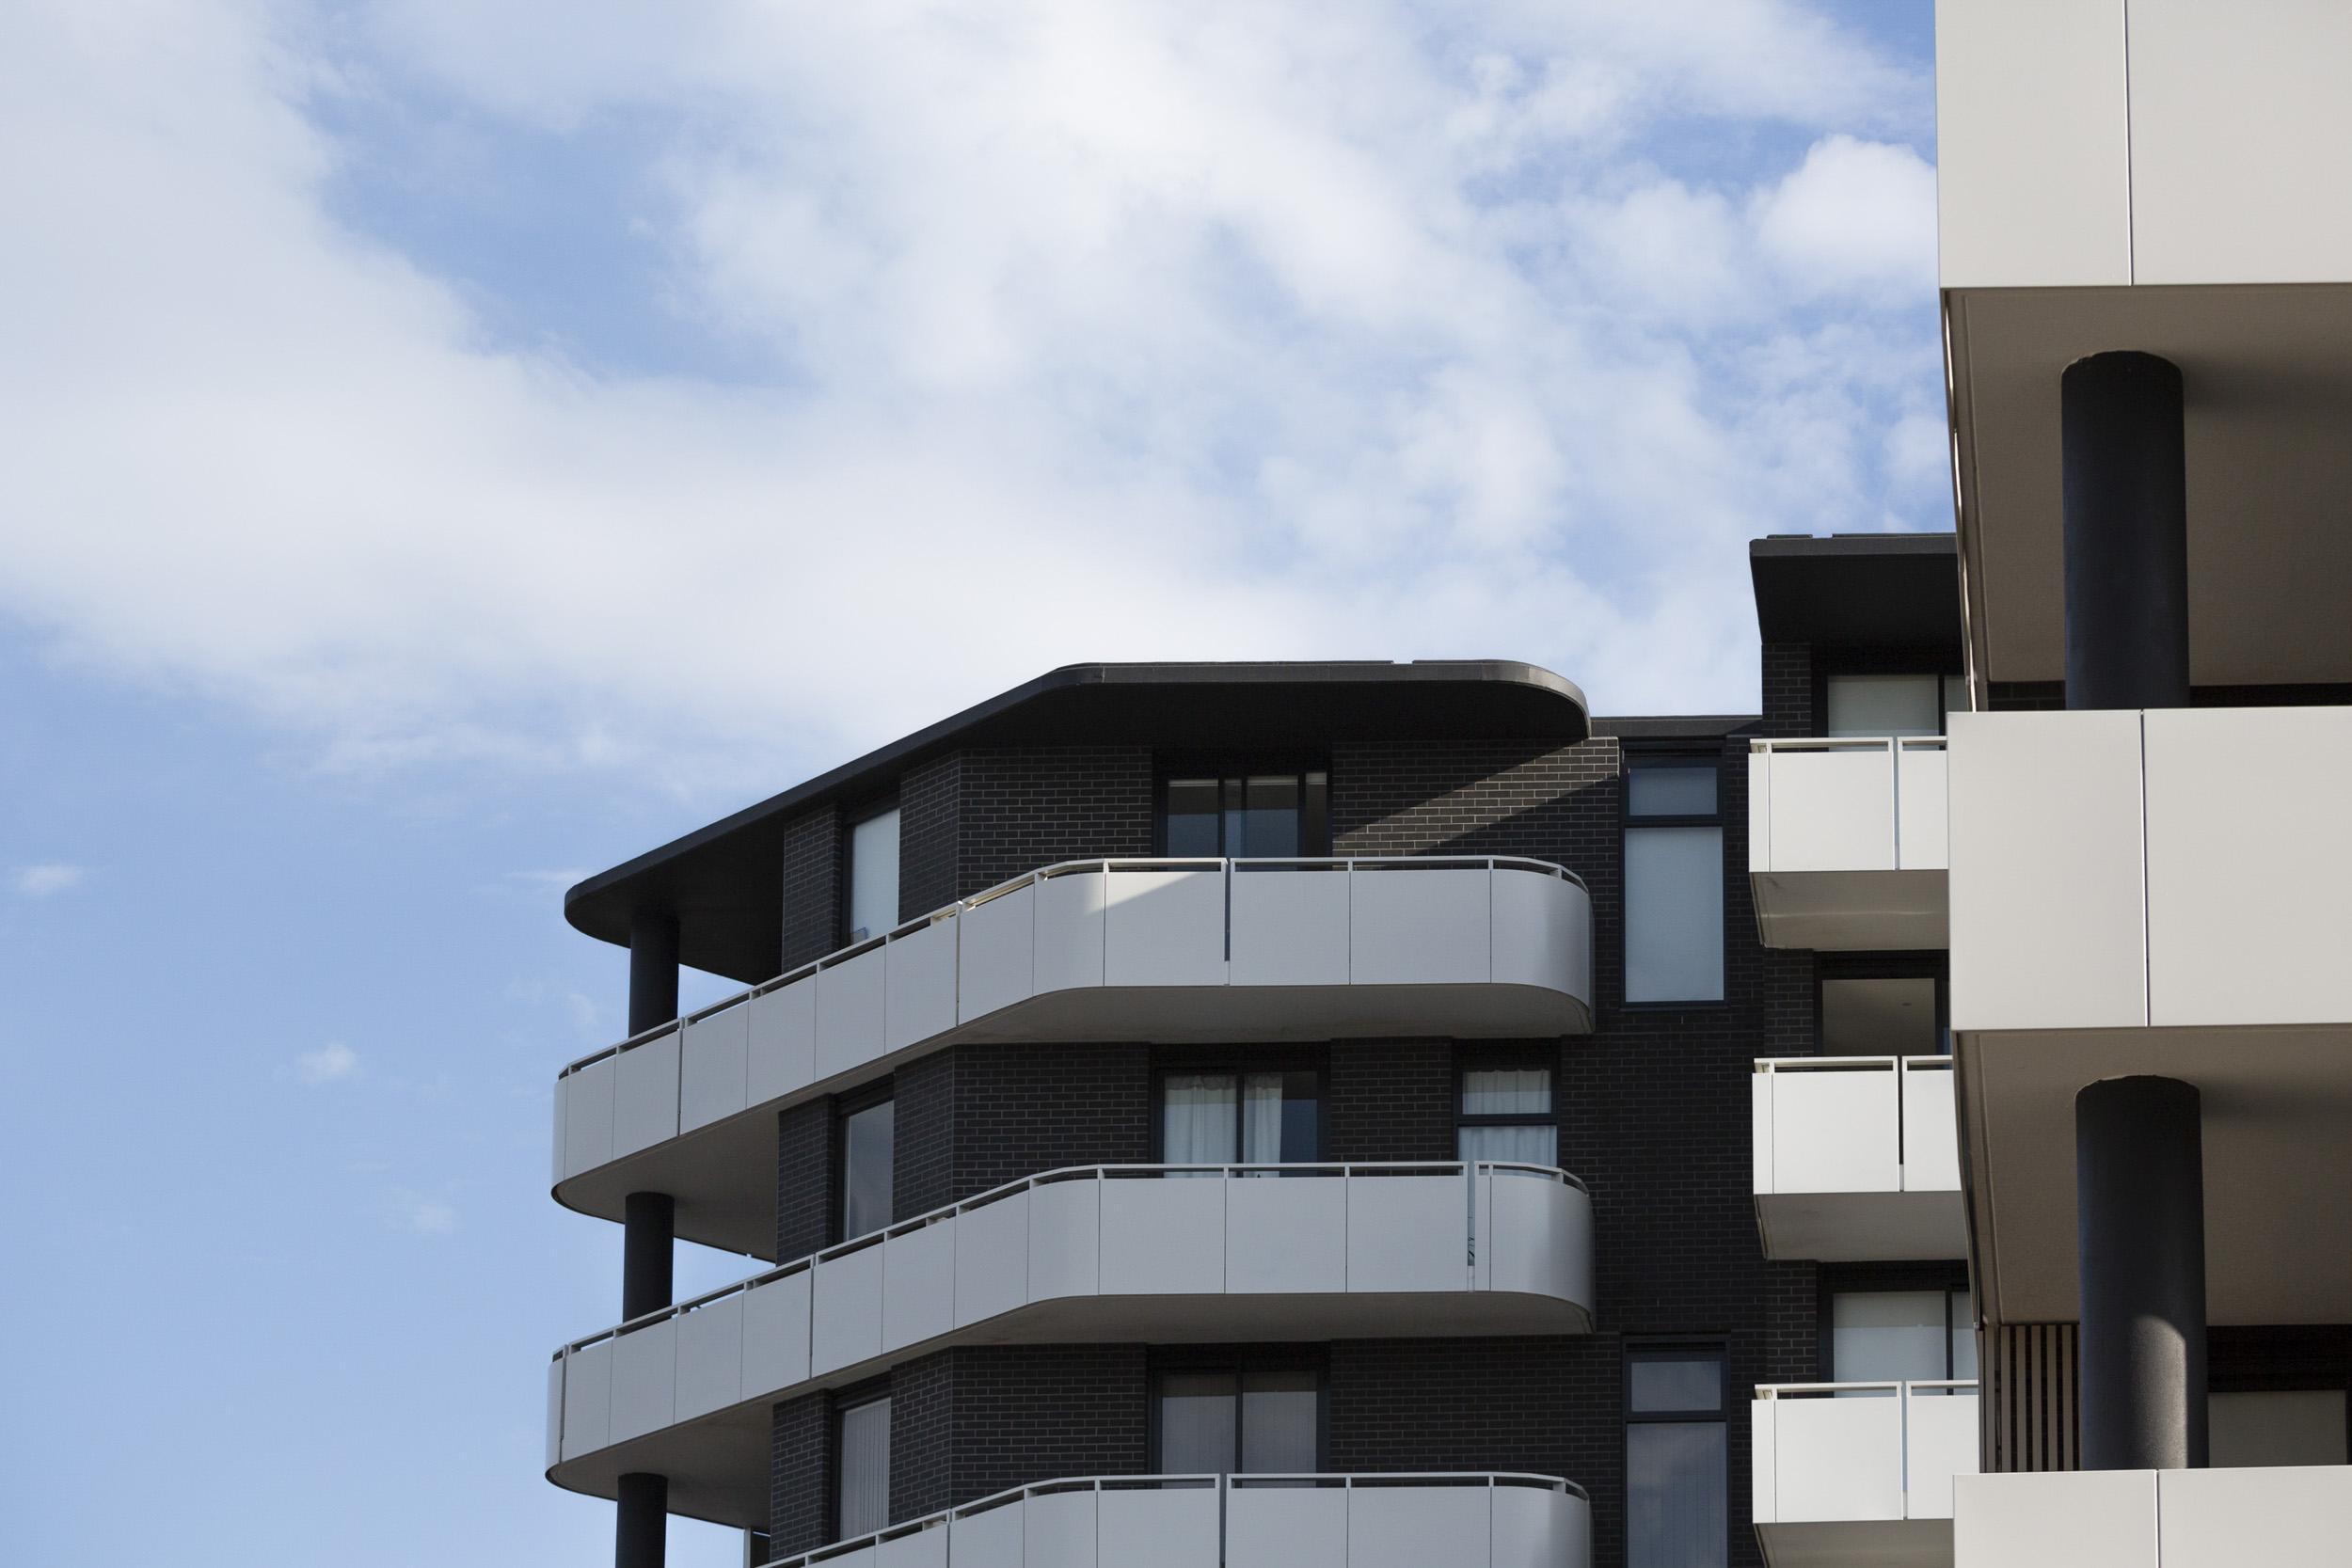 architecture_photography_sydney_australia_23.jpg